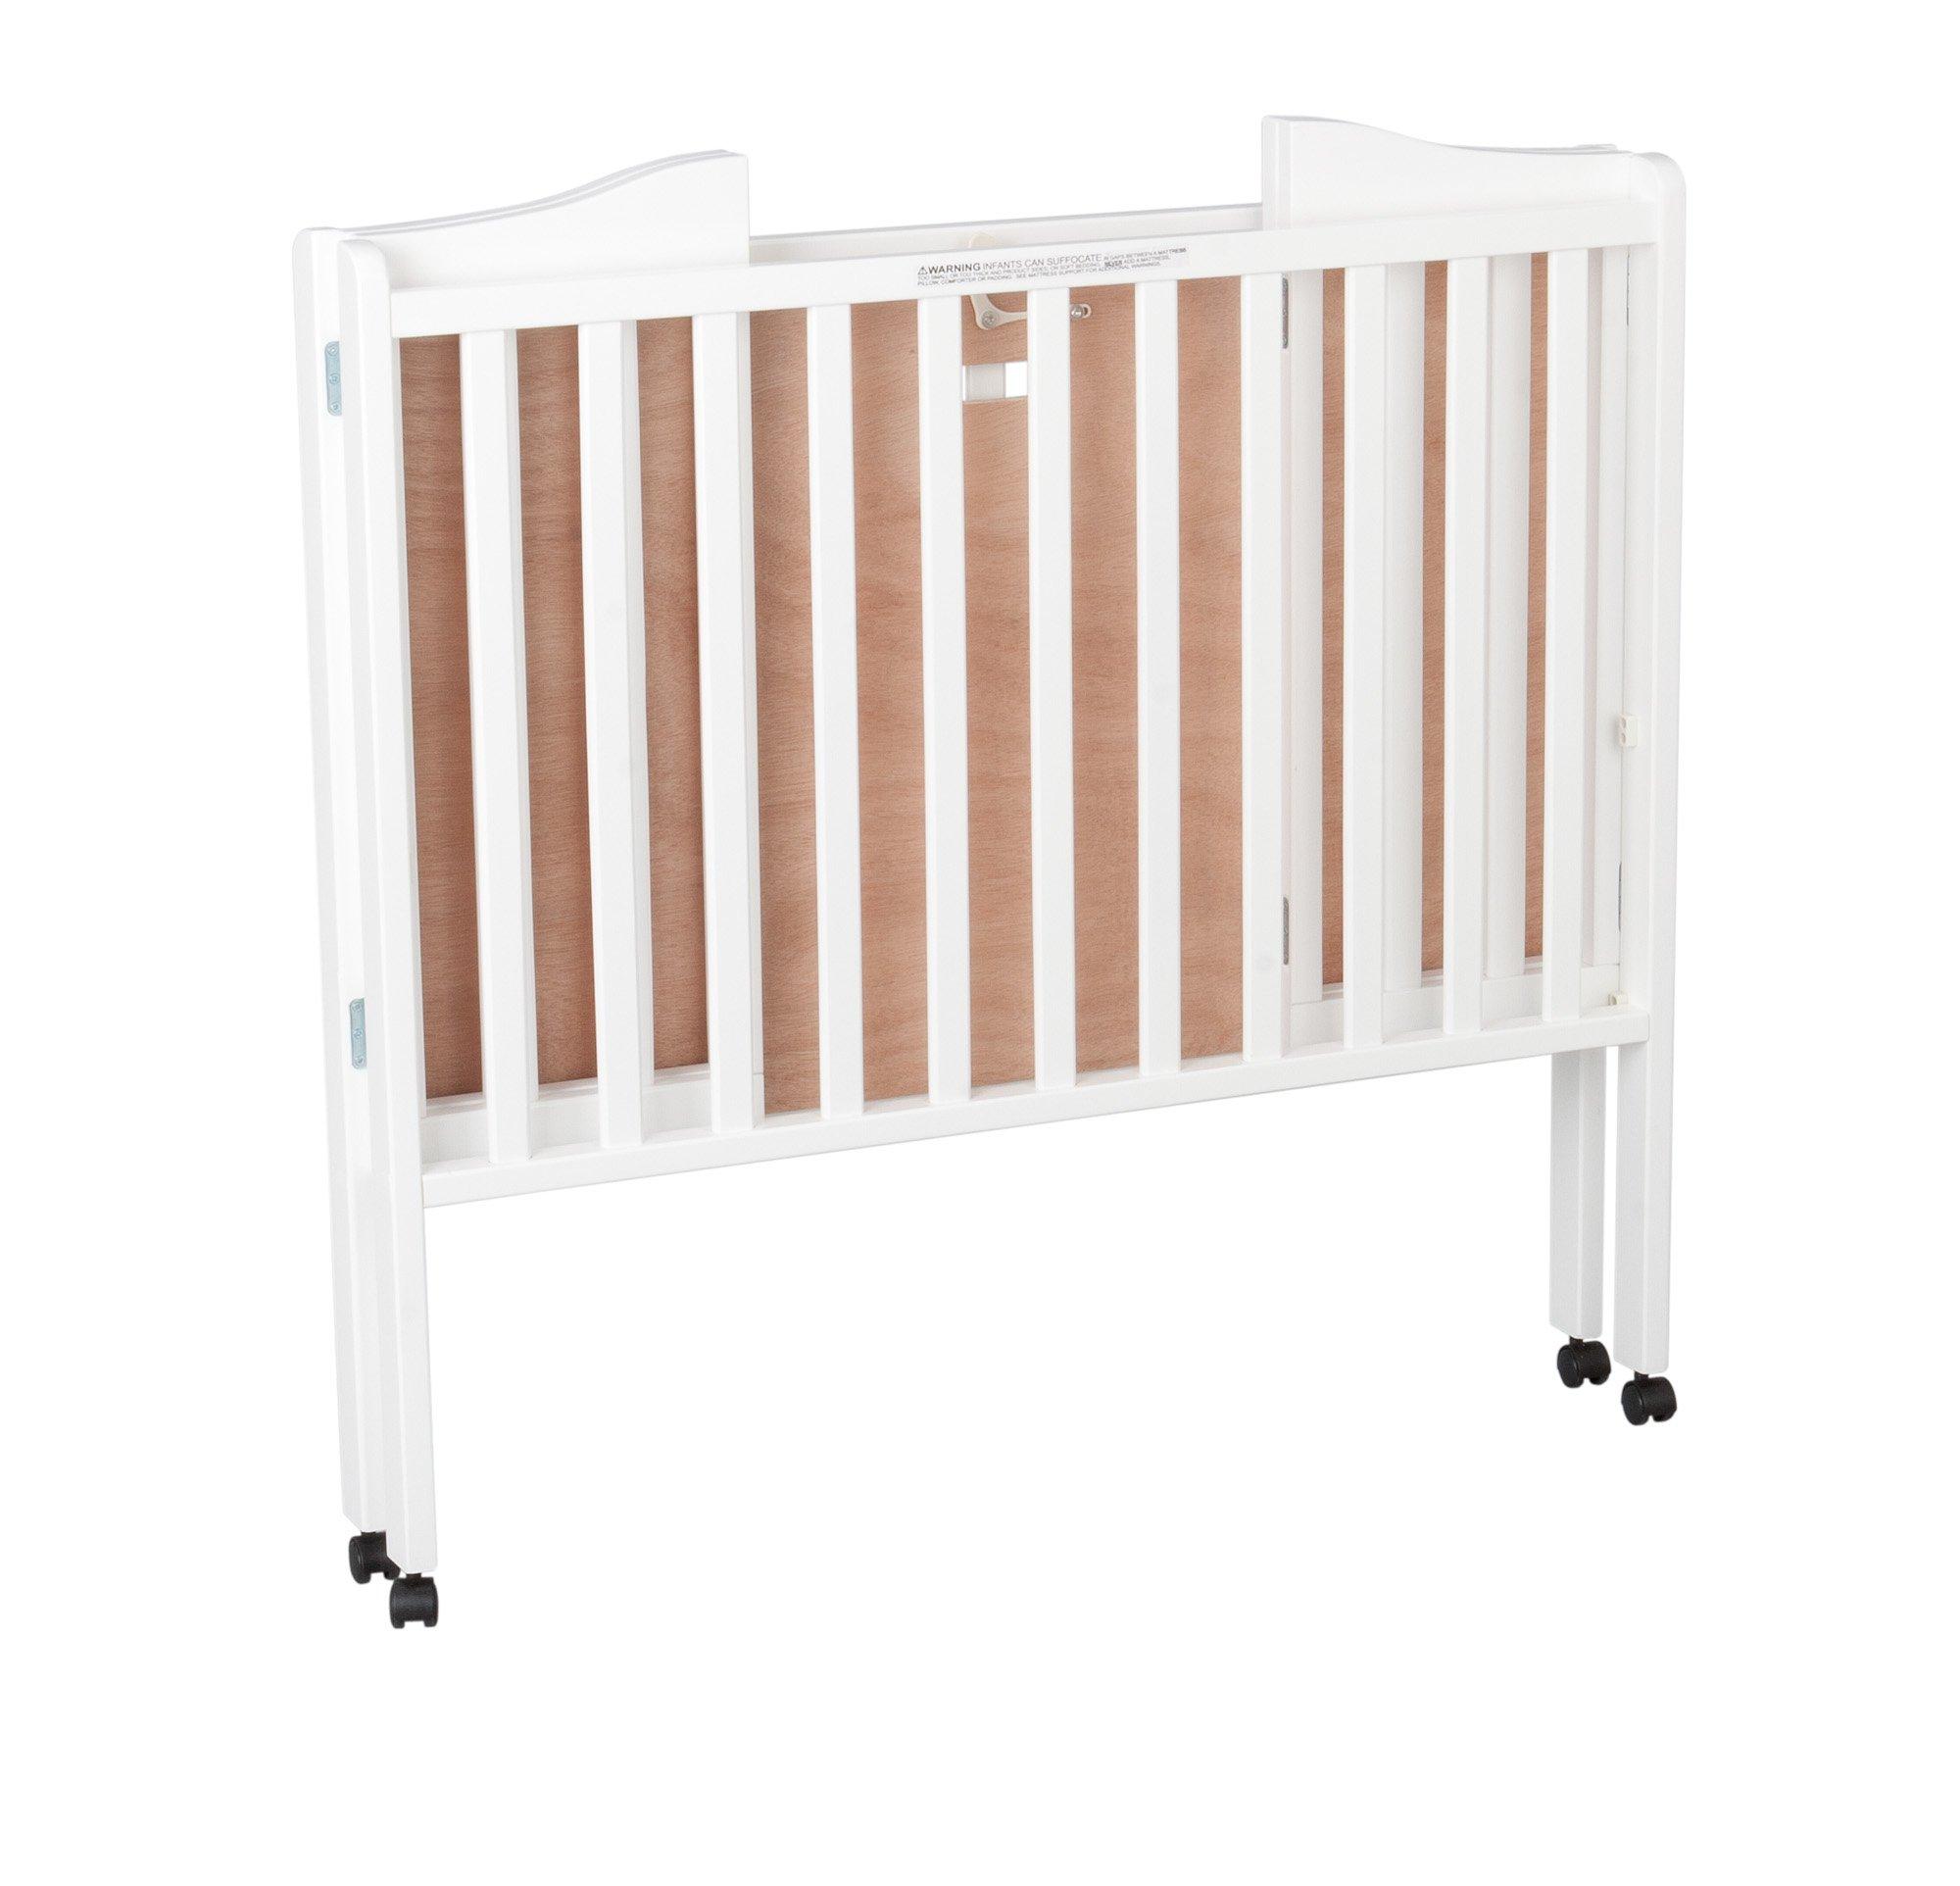 Delta Children Folding Portable Mini Crib with Mattress, White by Delta Children (Image #3)